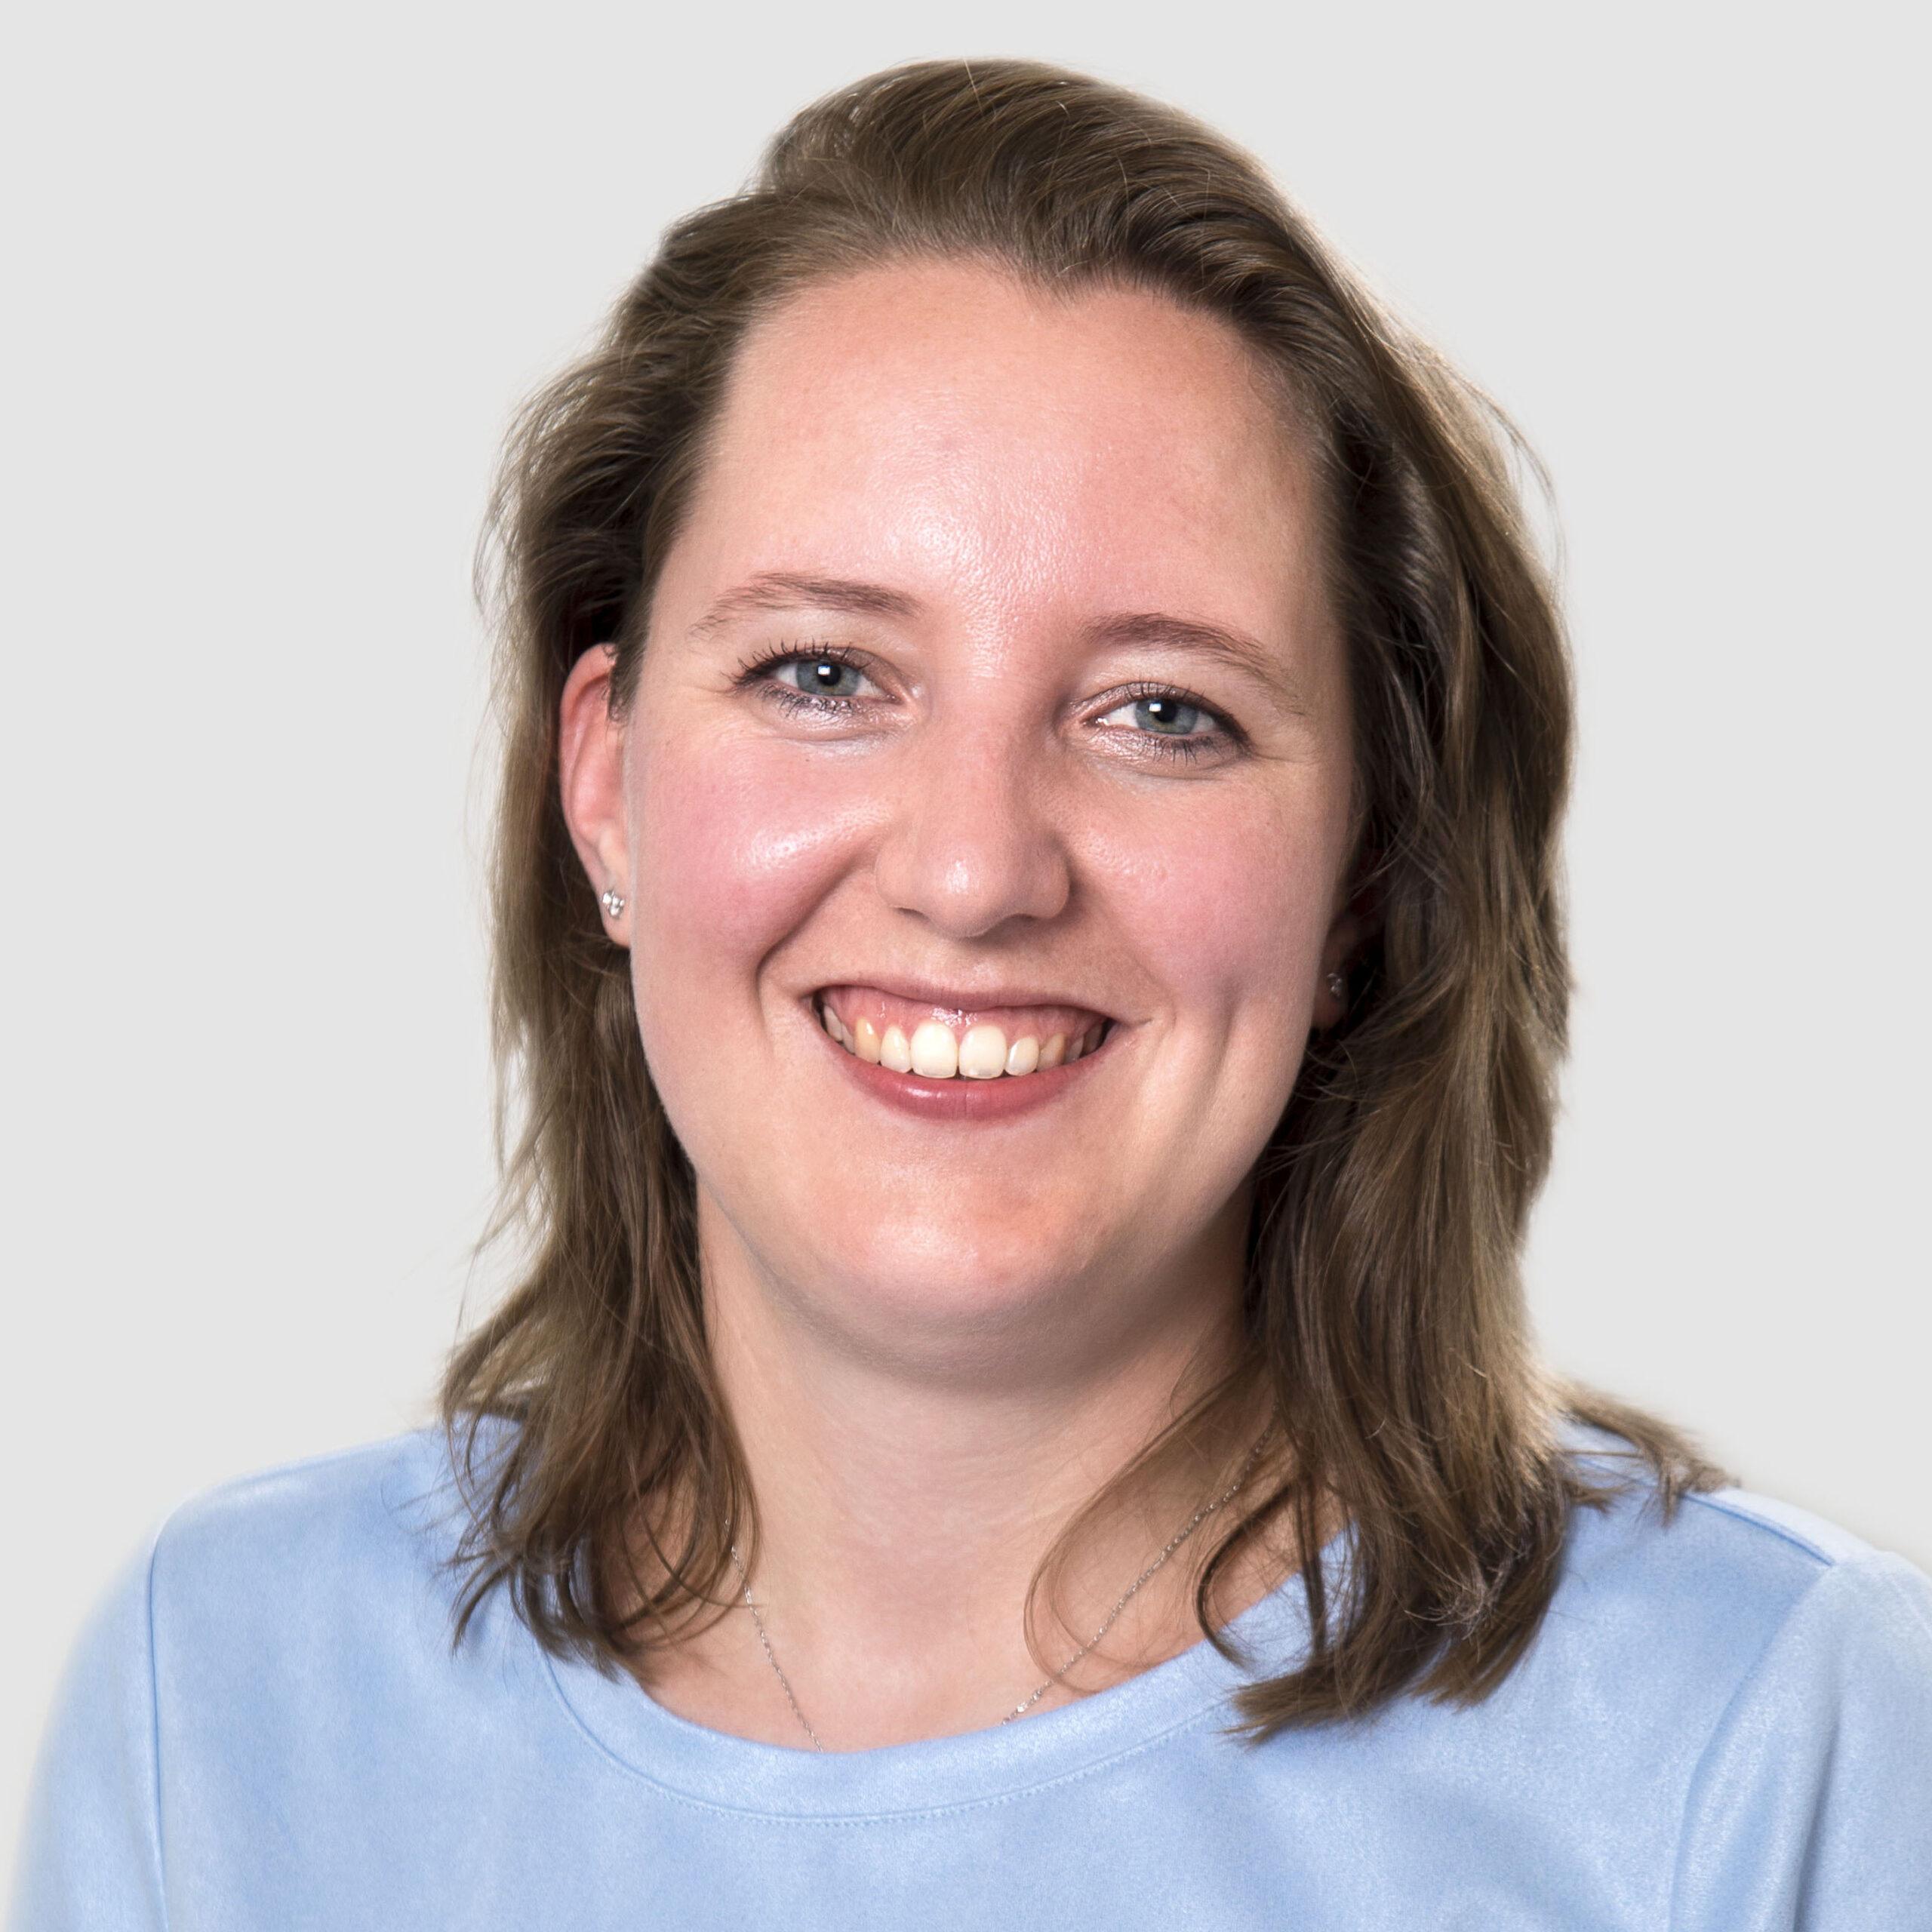 Leanne Kamps zorgprofessional Prodeba